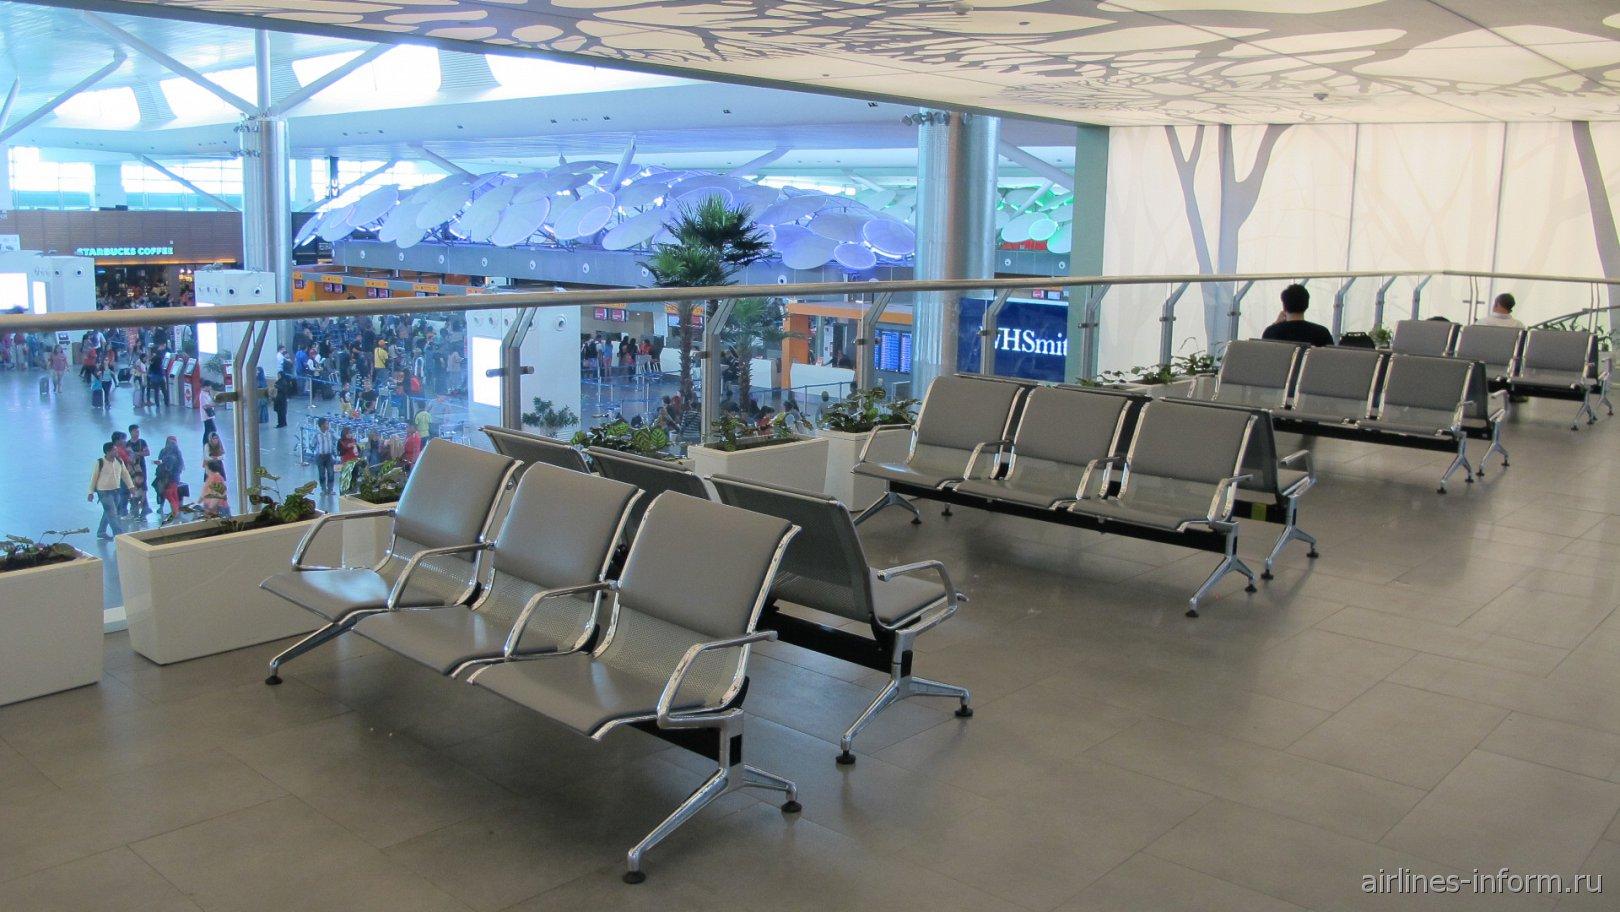 Зал ожидания в лоукост-терминале KLIA2 аэропорта Куала-Лумпур